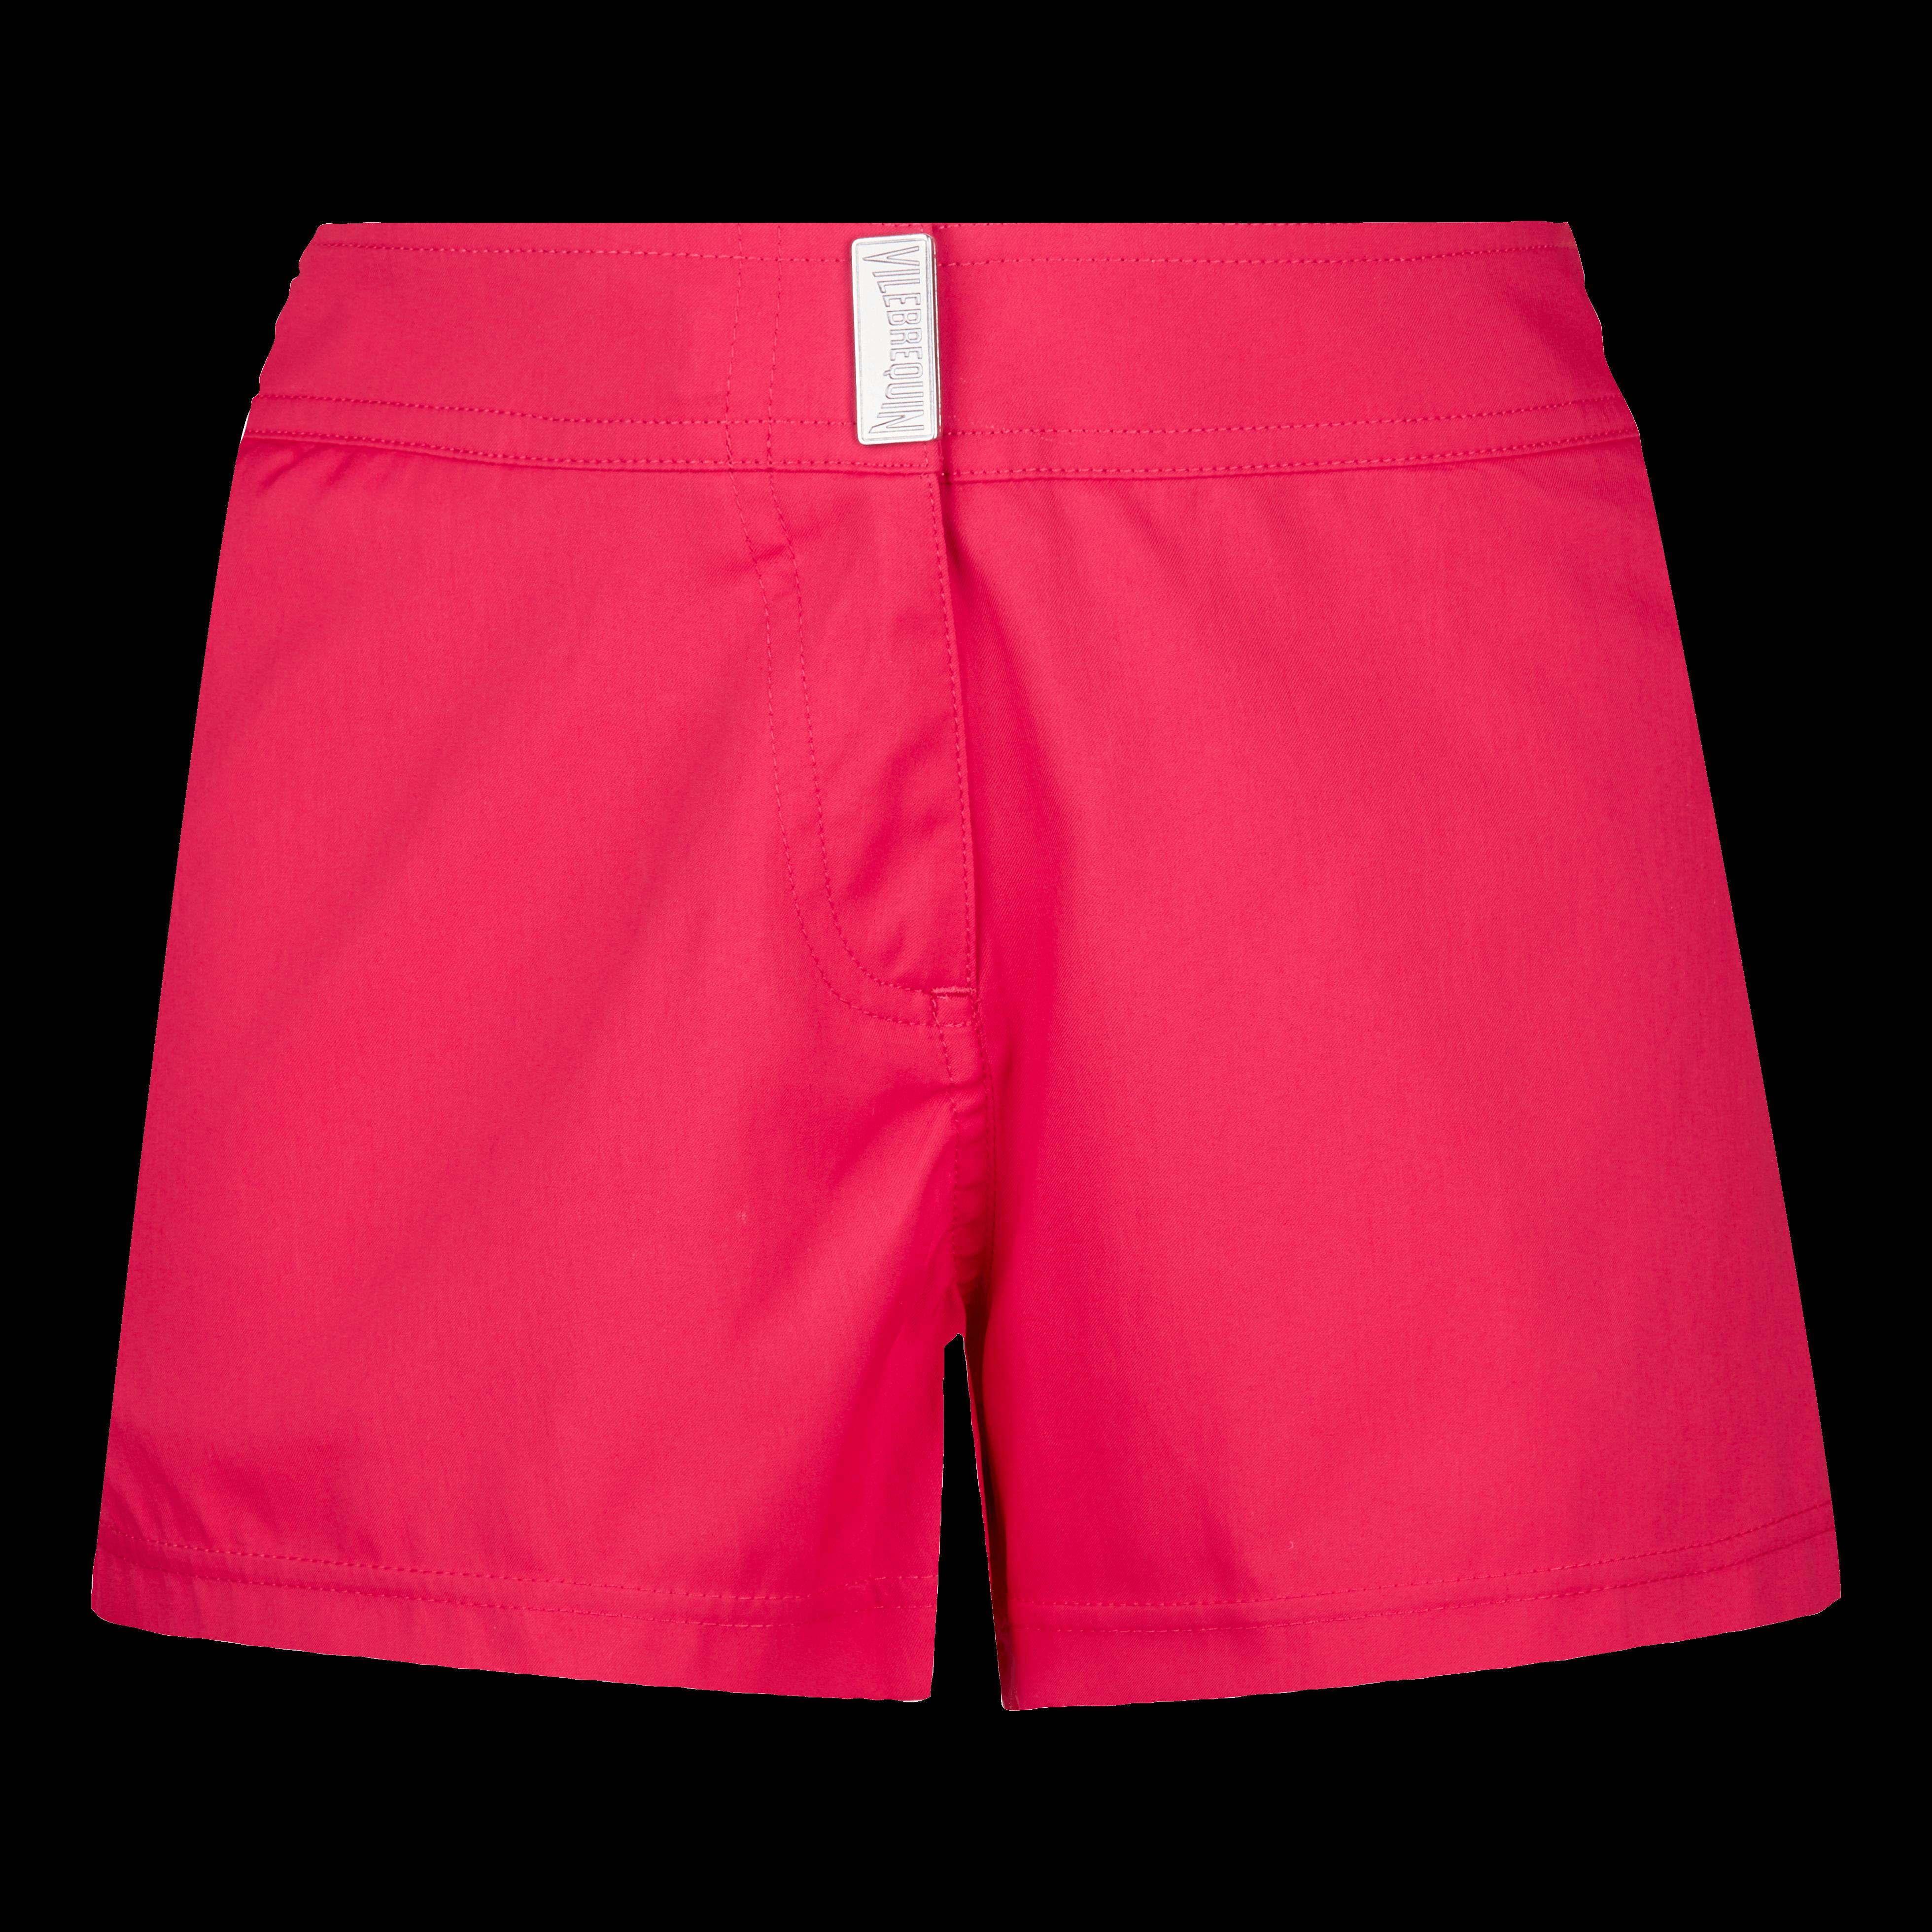 Vilebrequin Women Stretch Swim Short Solid In Red